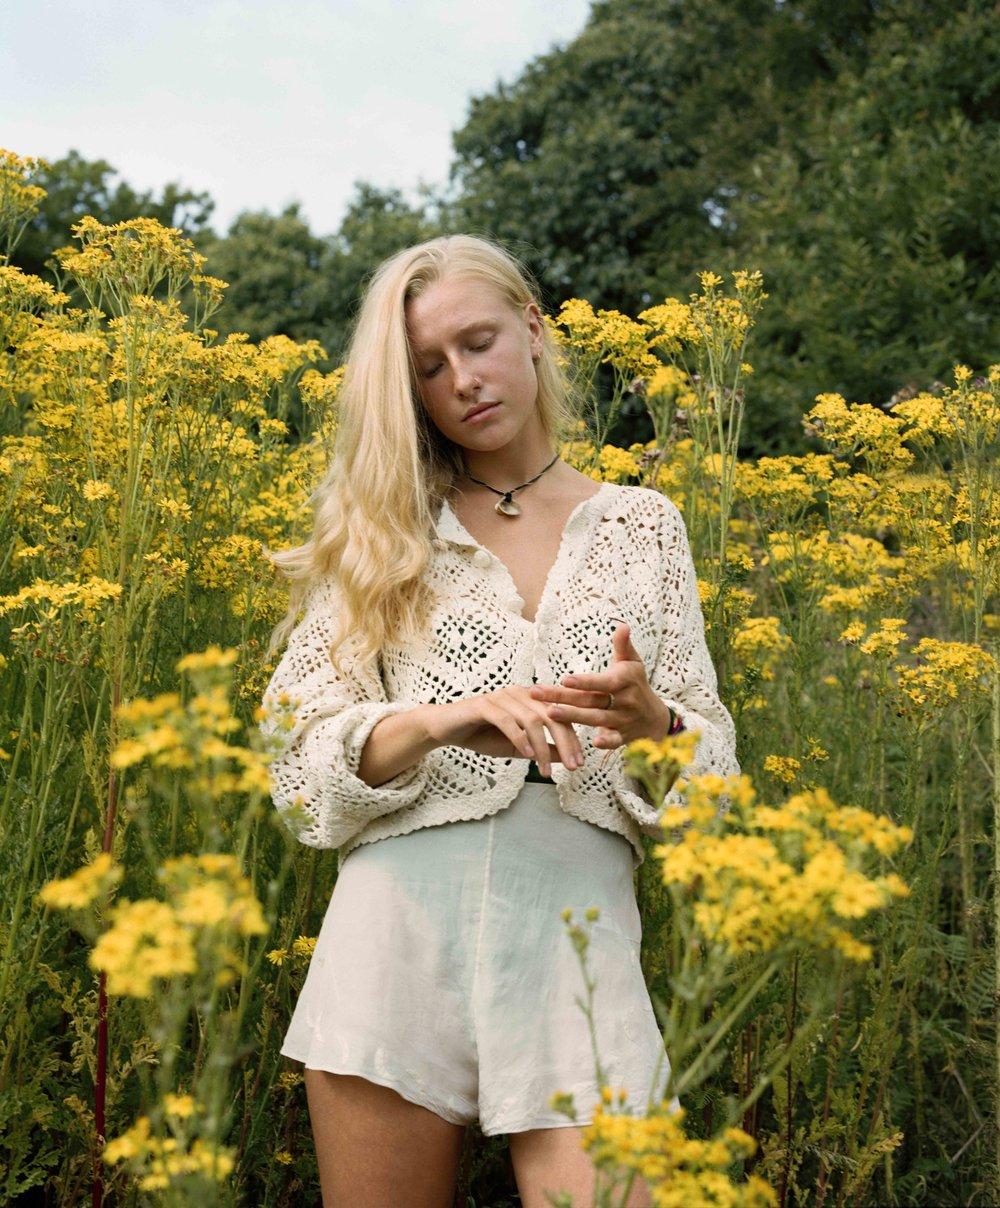 Feet Katie Silvester nude photos 2019